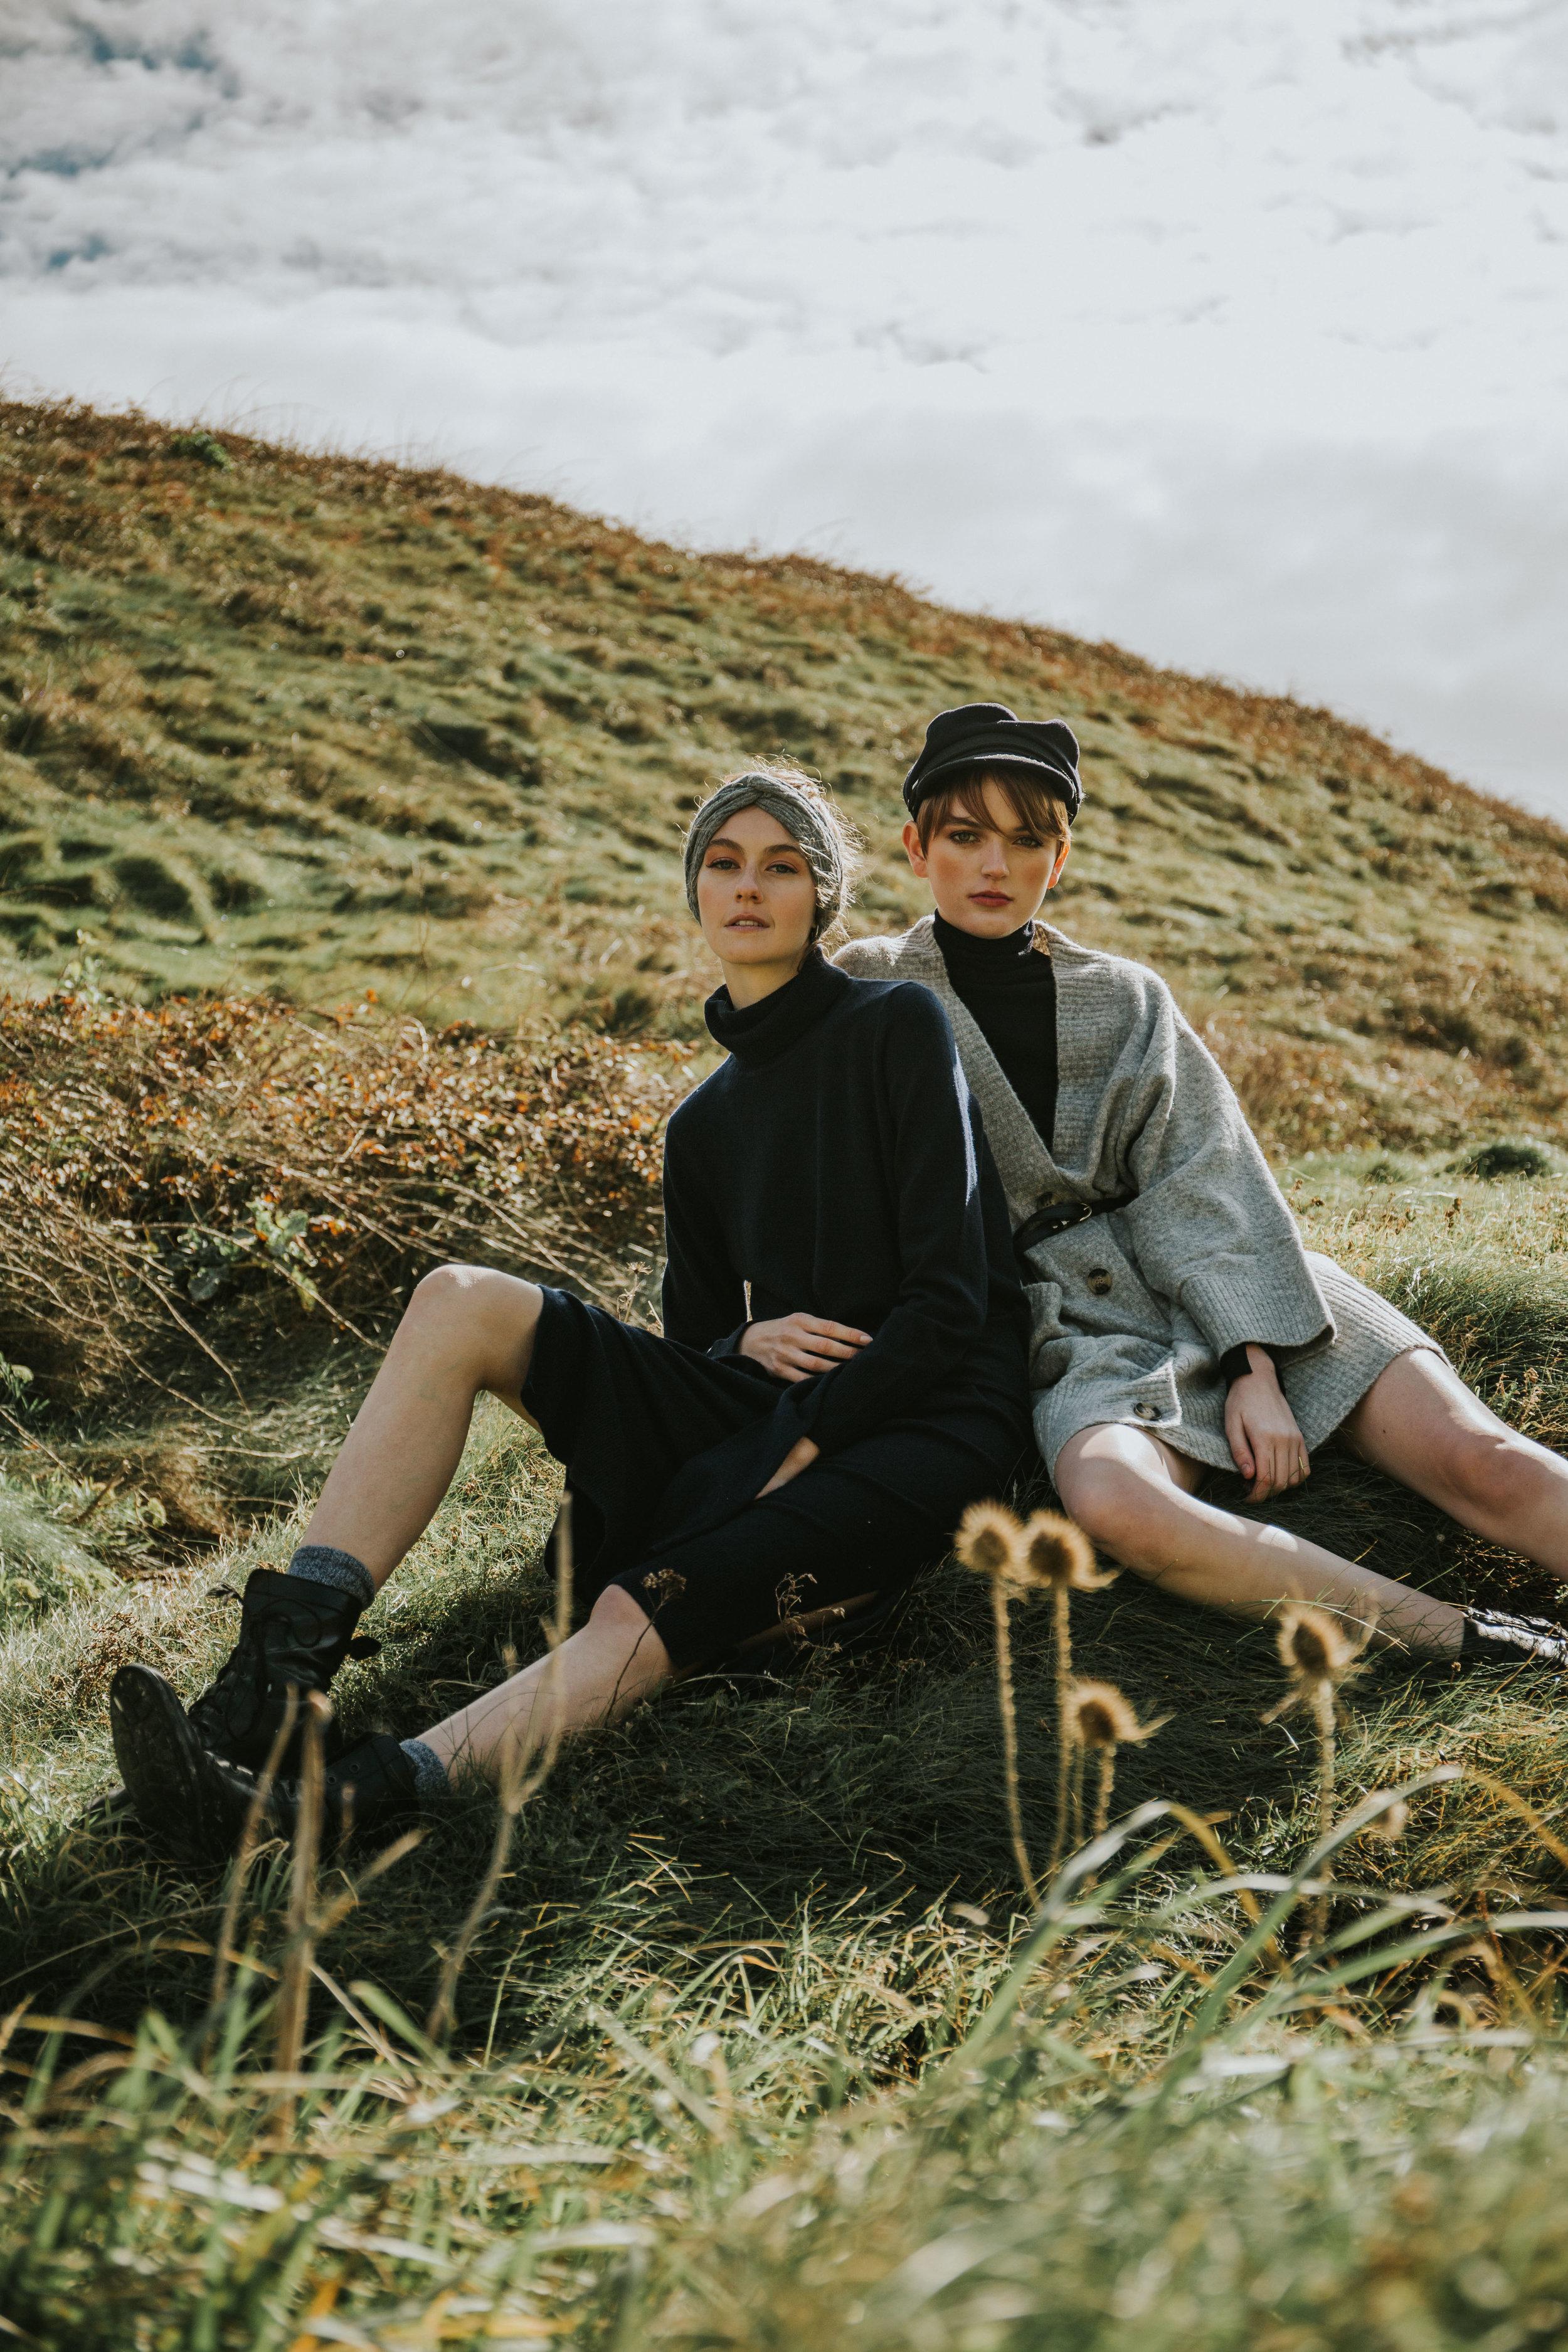 HighlandHers Editorial Fashion Photography in Etretat